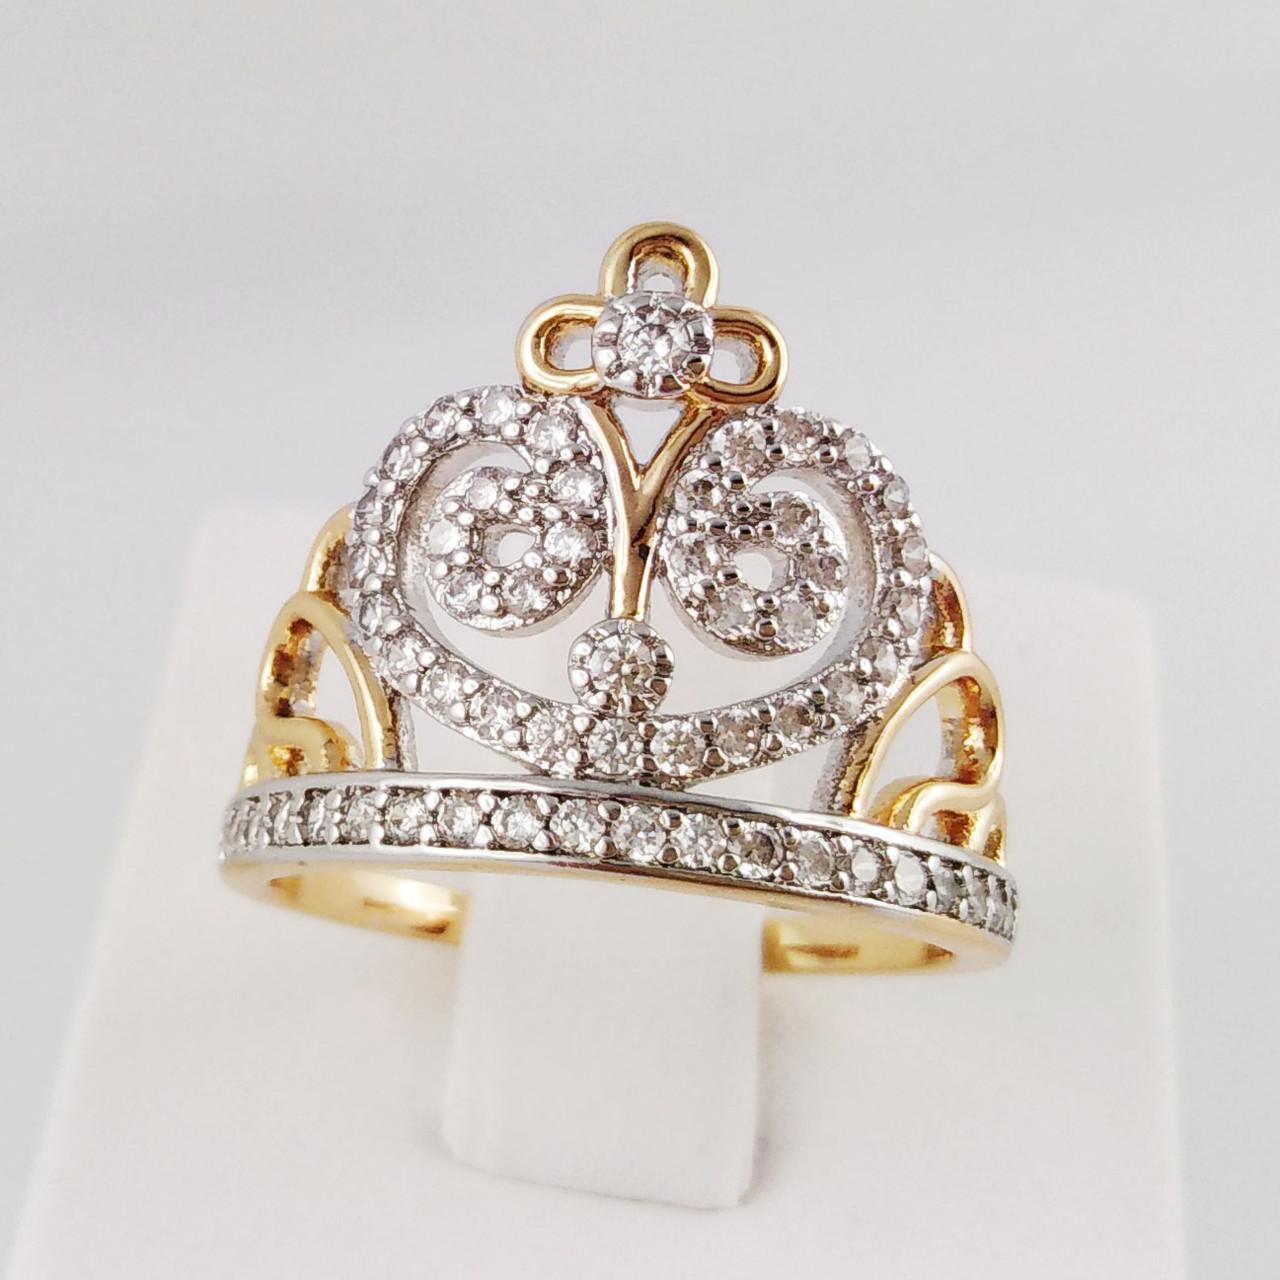 "Кольцо Xuping Jewelry  ""Корона для леди"" размер 19, медицинское золото, позолота 18К + родий. А/В 1947"